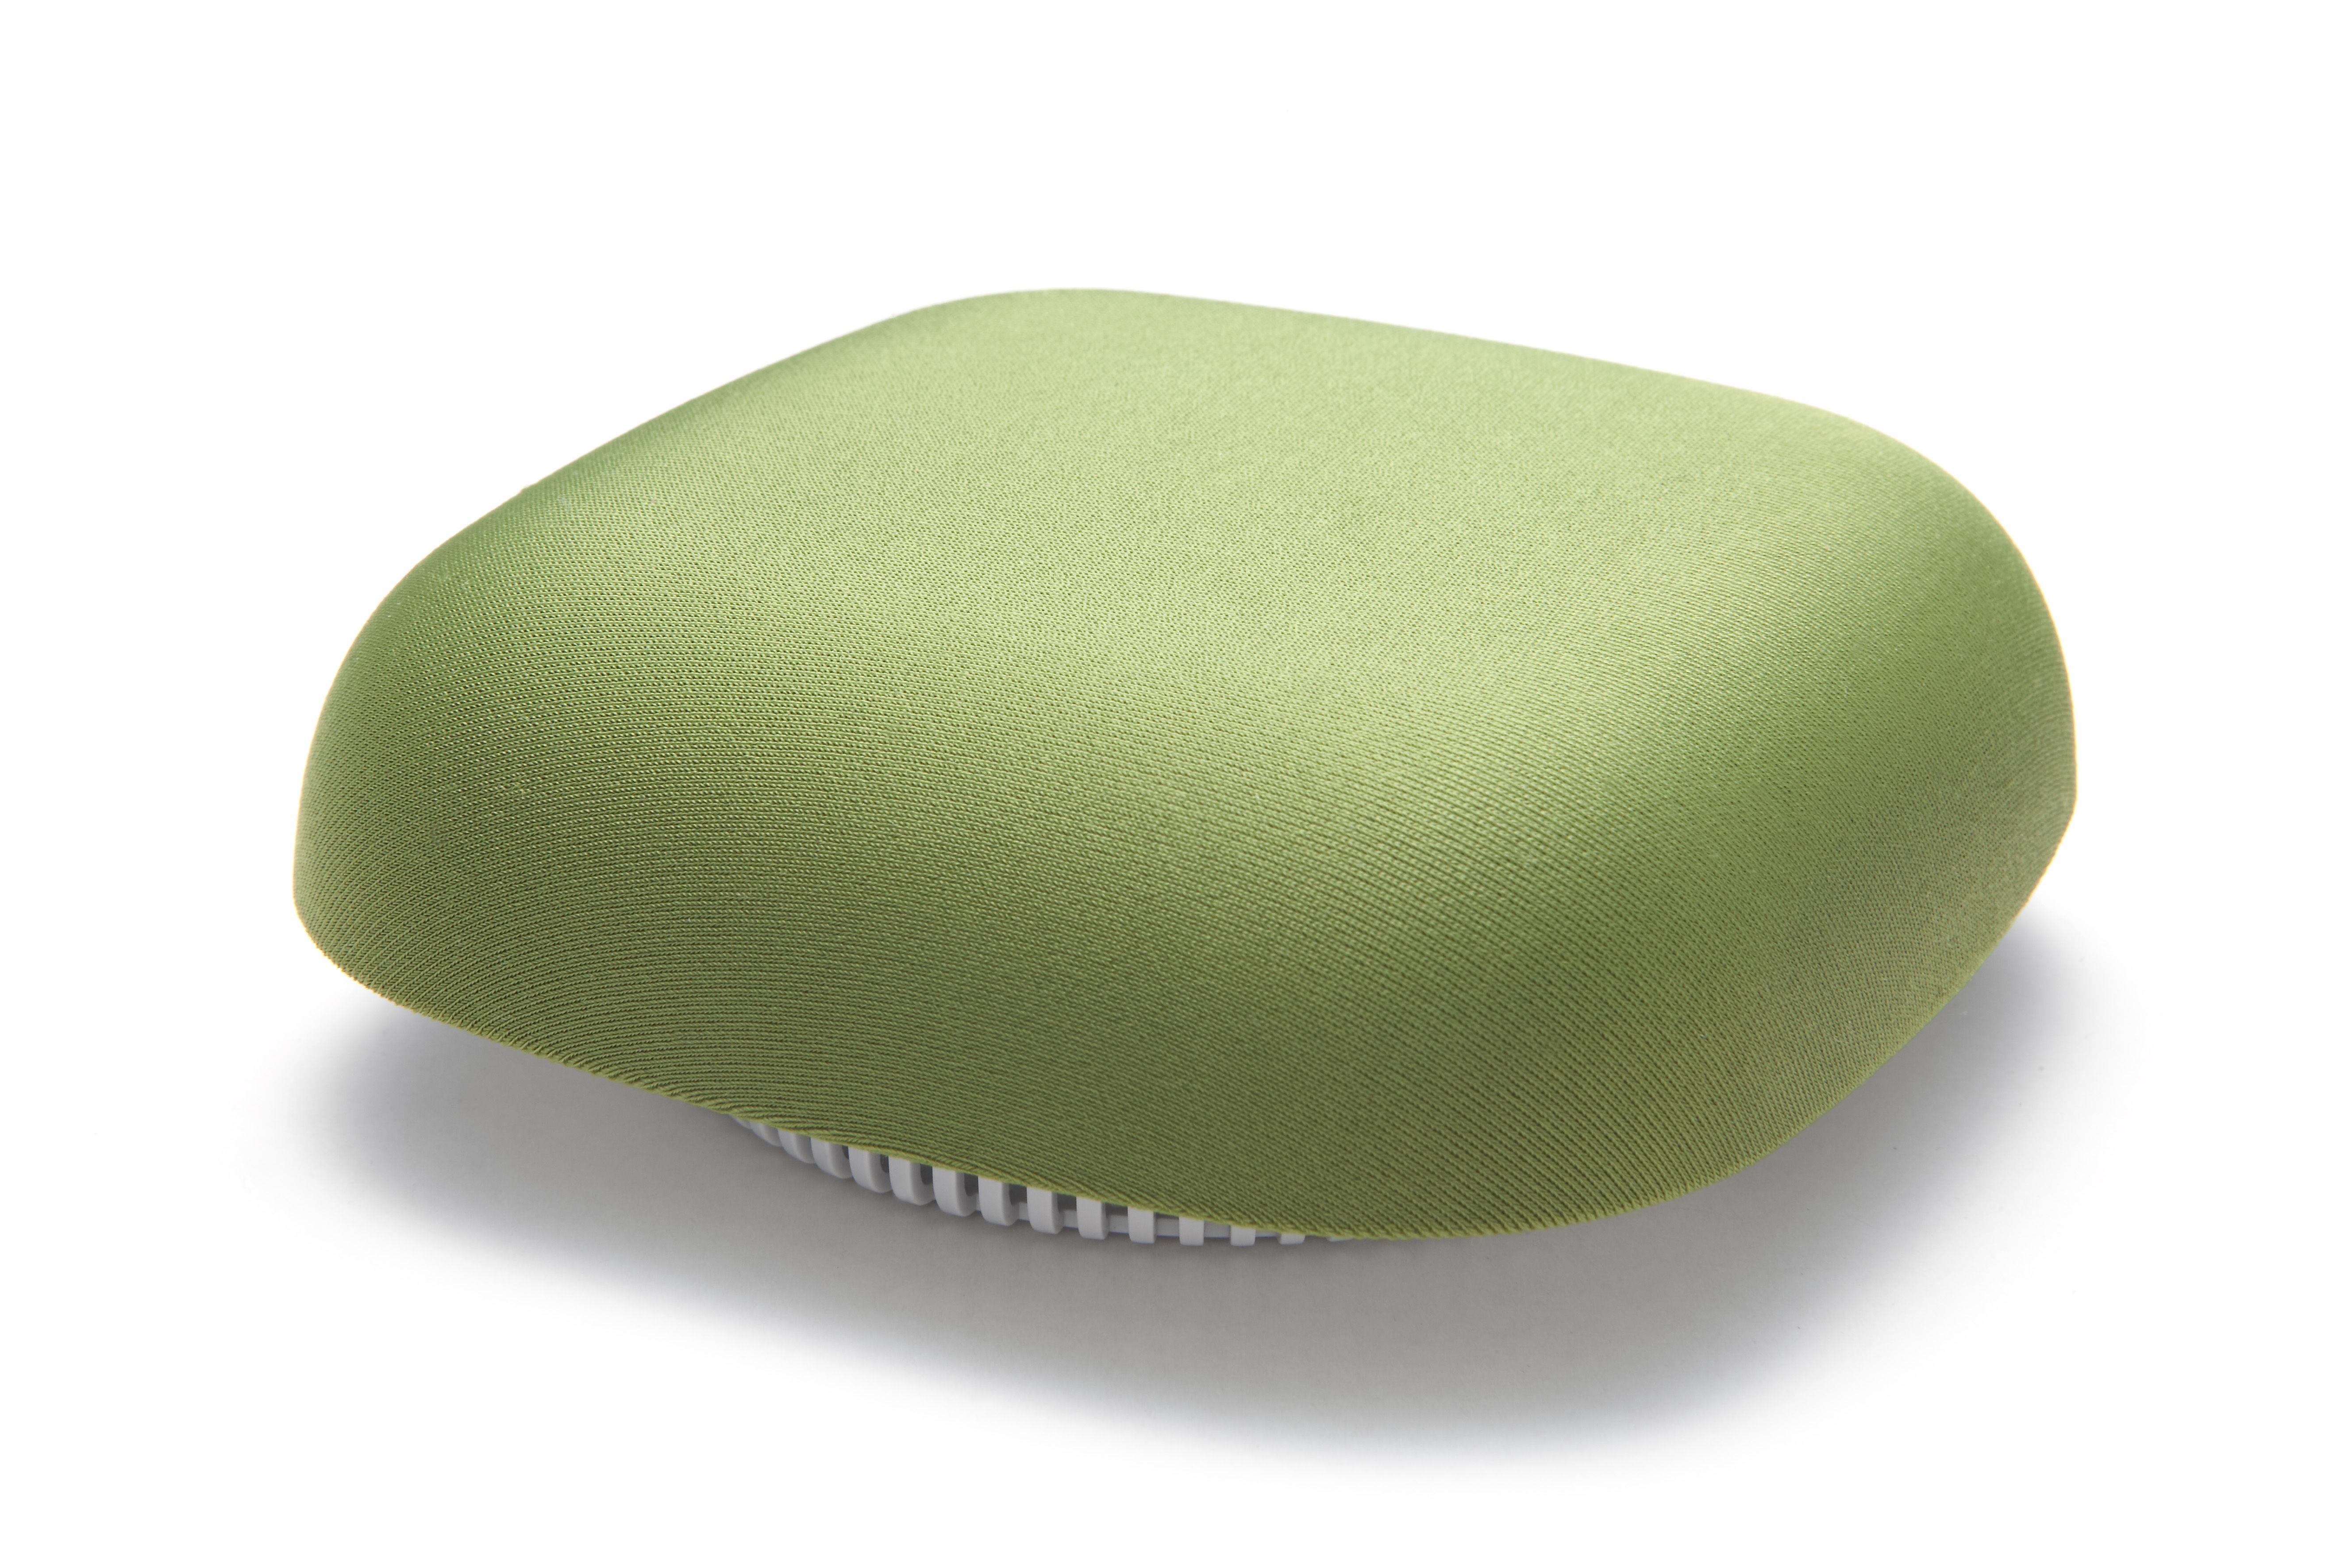 Accessories - Home Accessories - Kupu Smoke alarm - Sticky by Jalo Helsinki - Green - Fabric, Plastic material